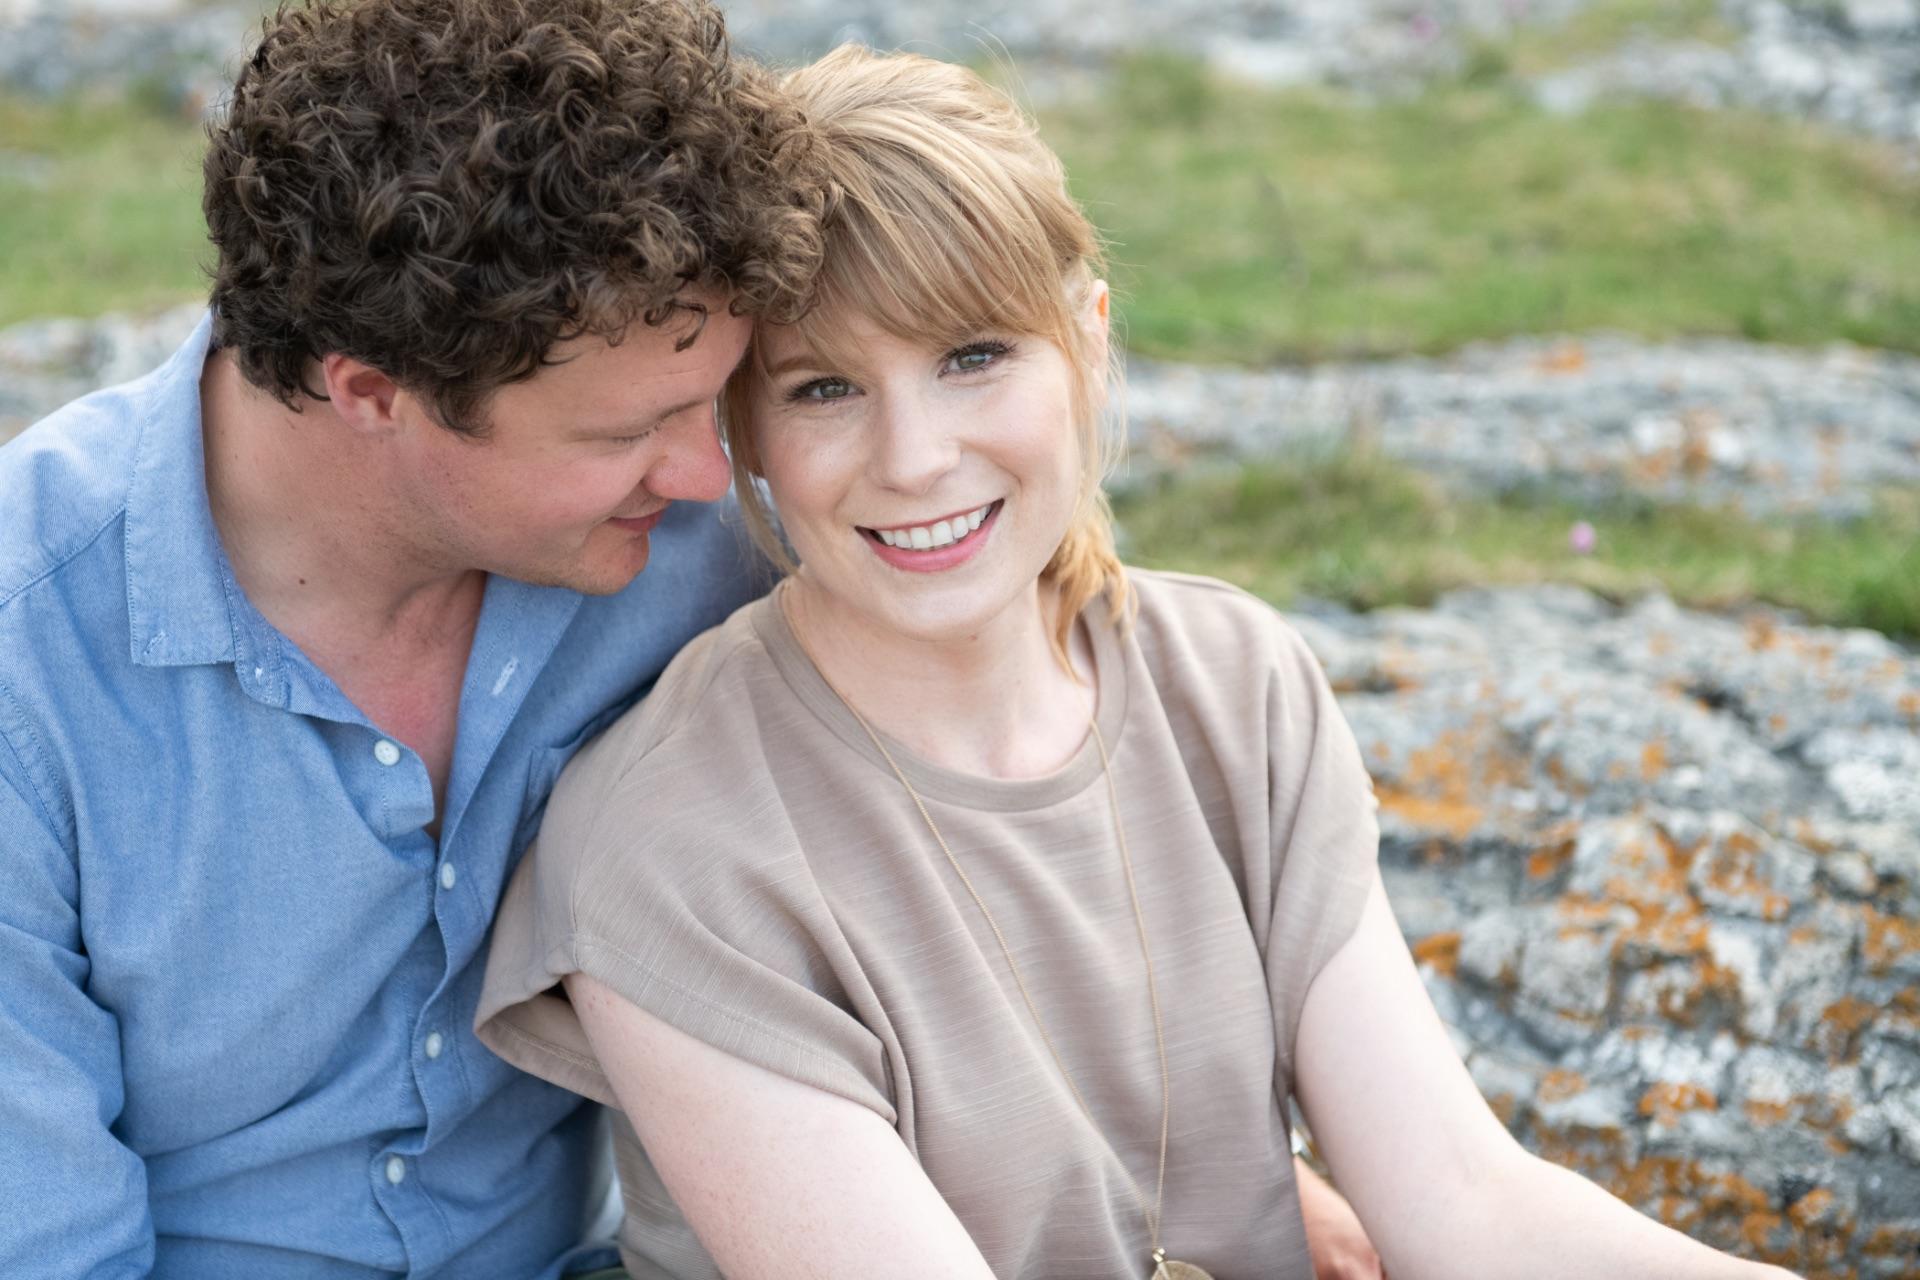 Northern Ireland wedding photographer – Five ways to celebrate your original wedding date